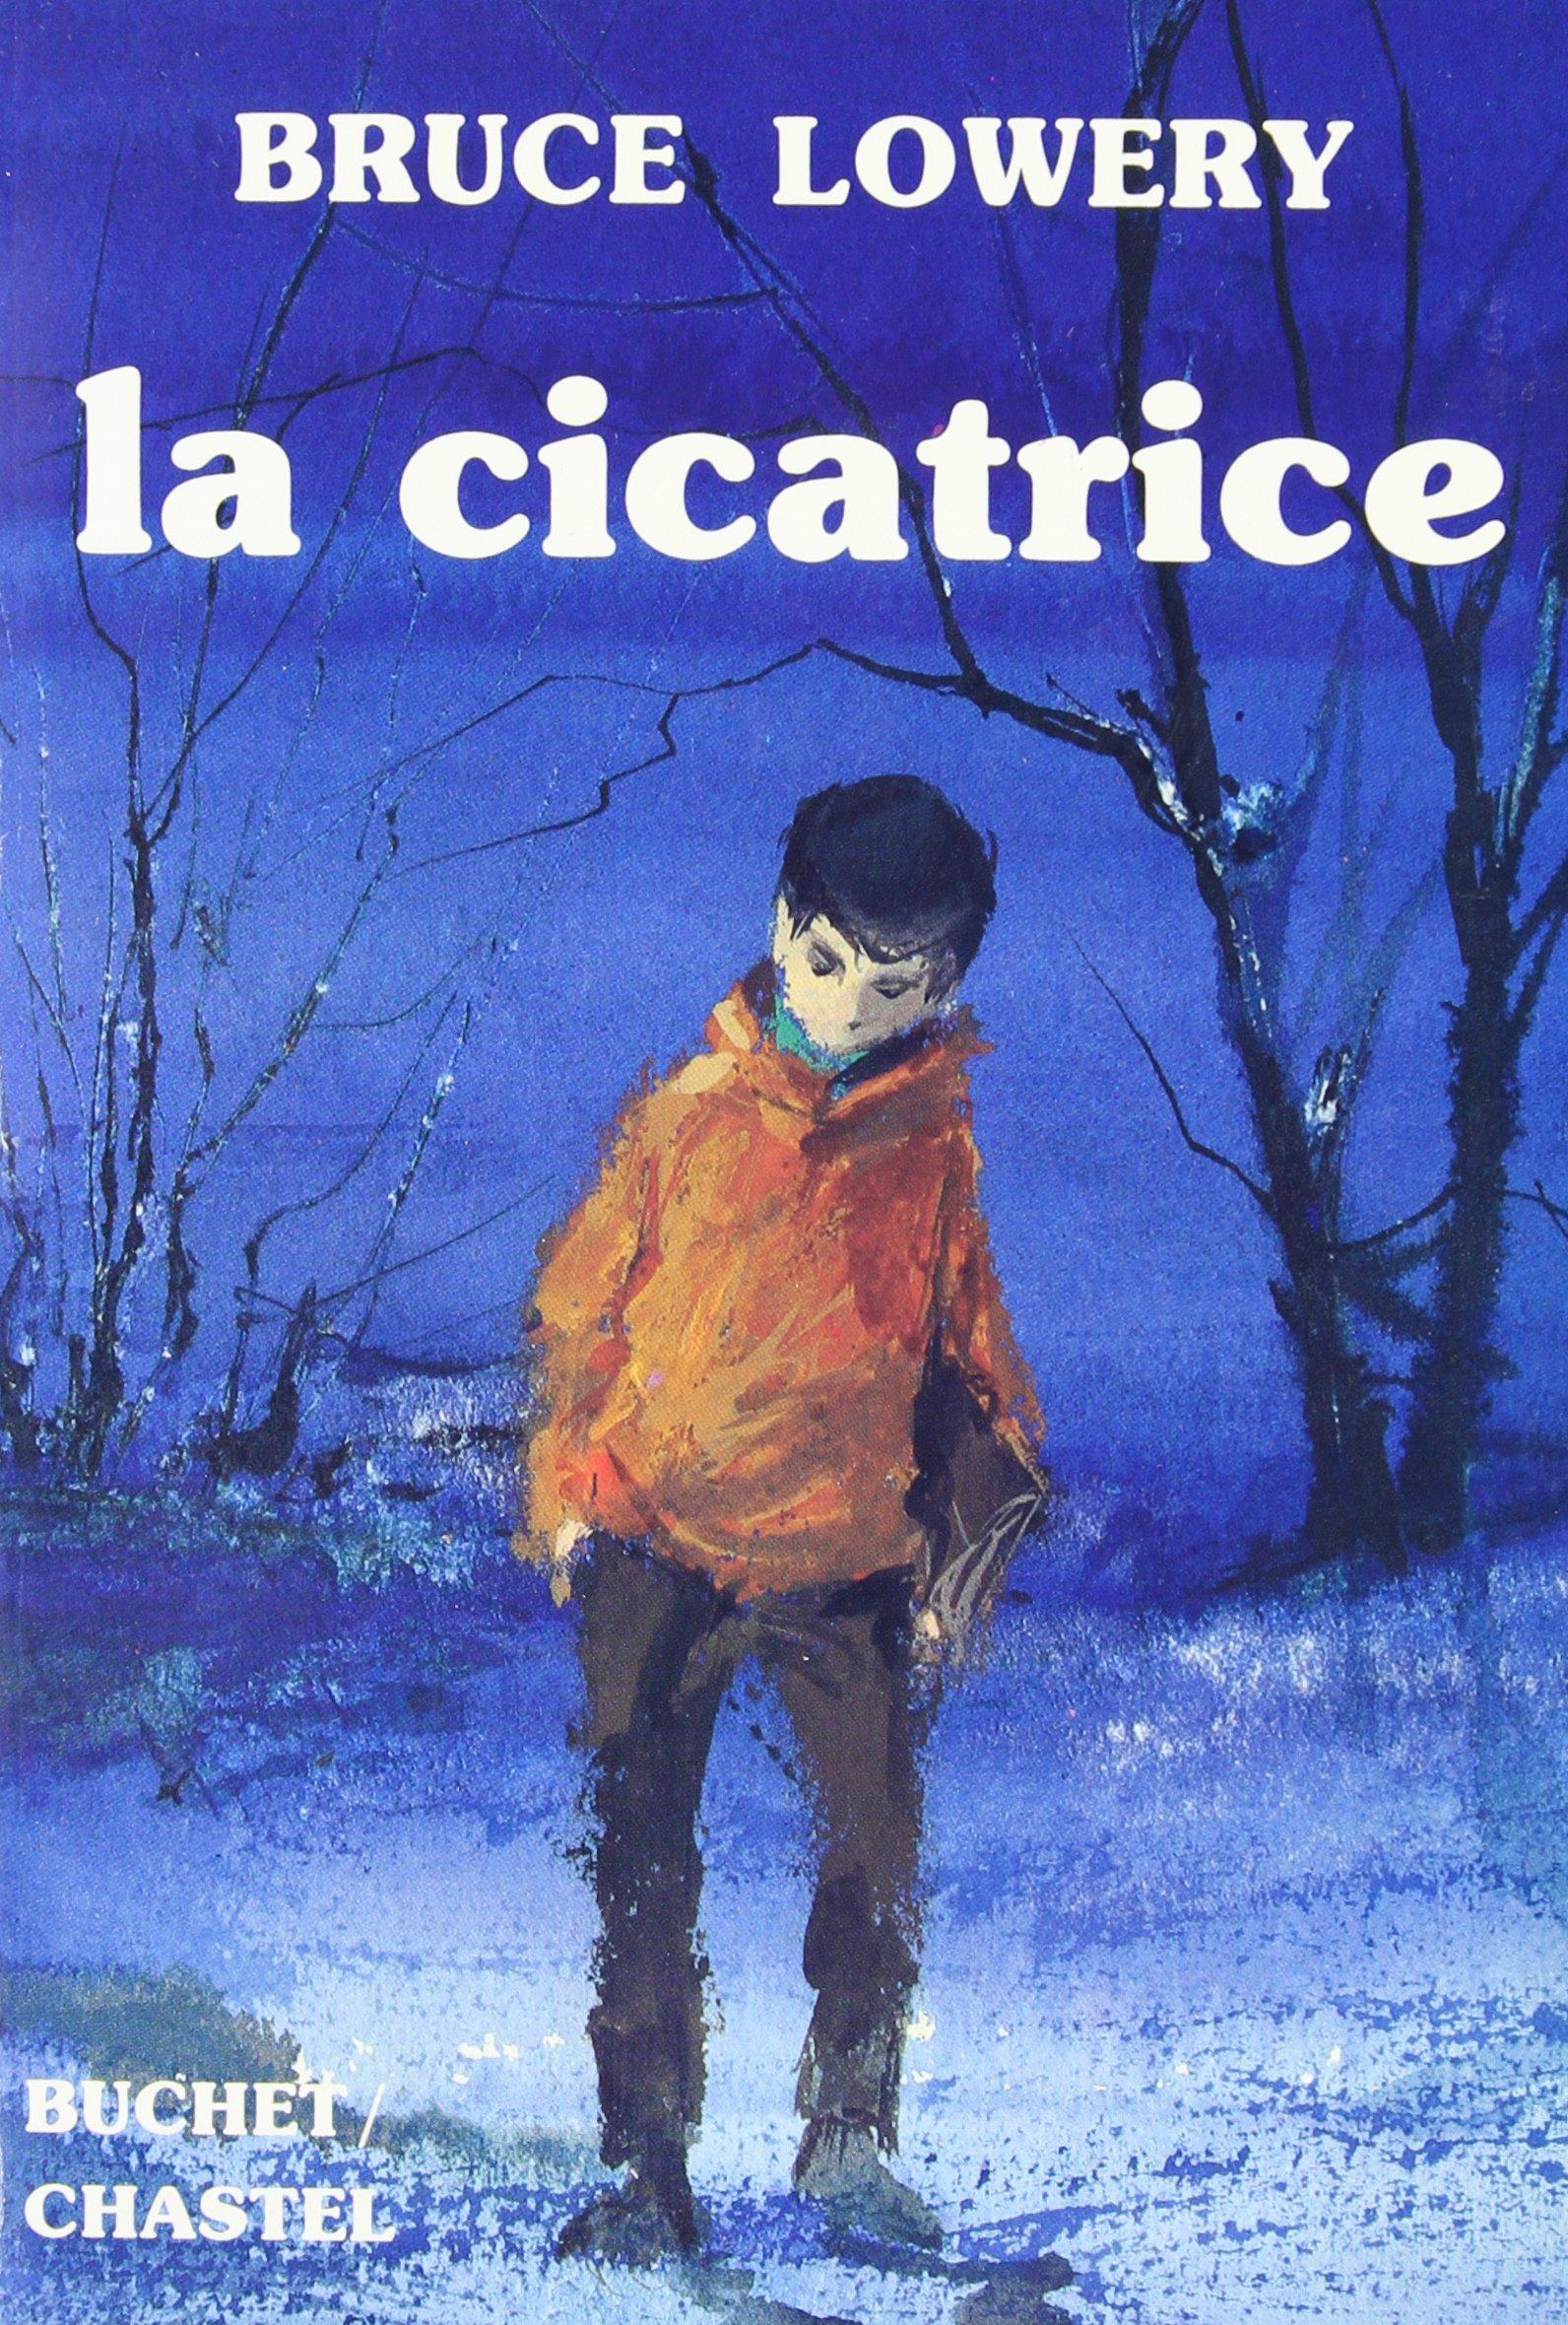 TÉLÉCHARGER LA CICATRICE BRUCE LOWERY PDF